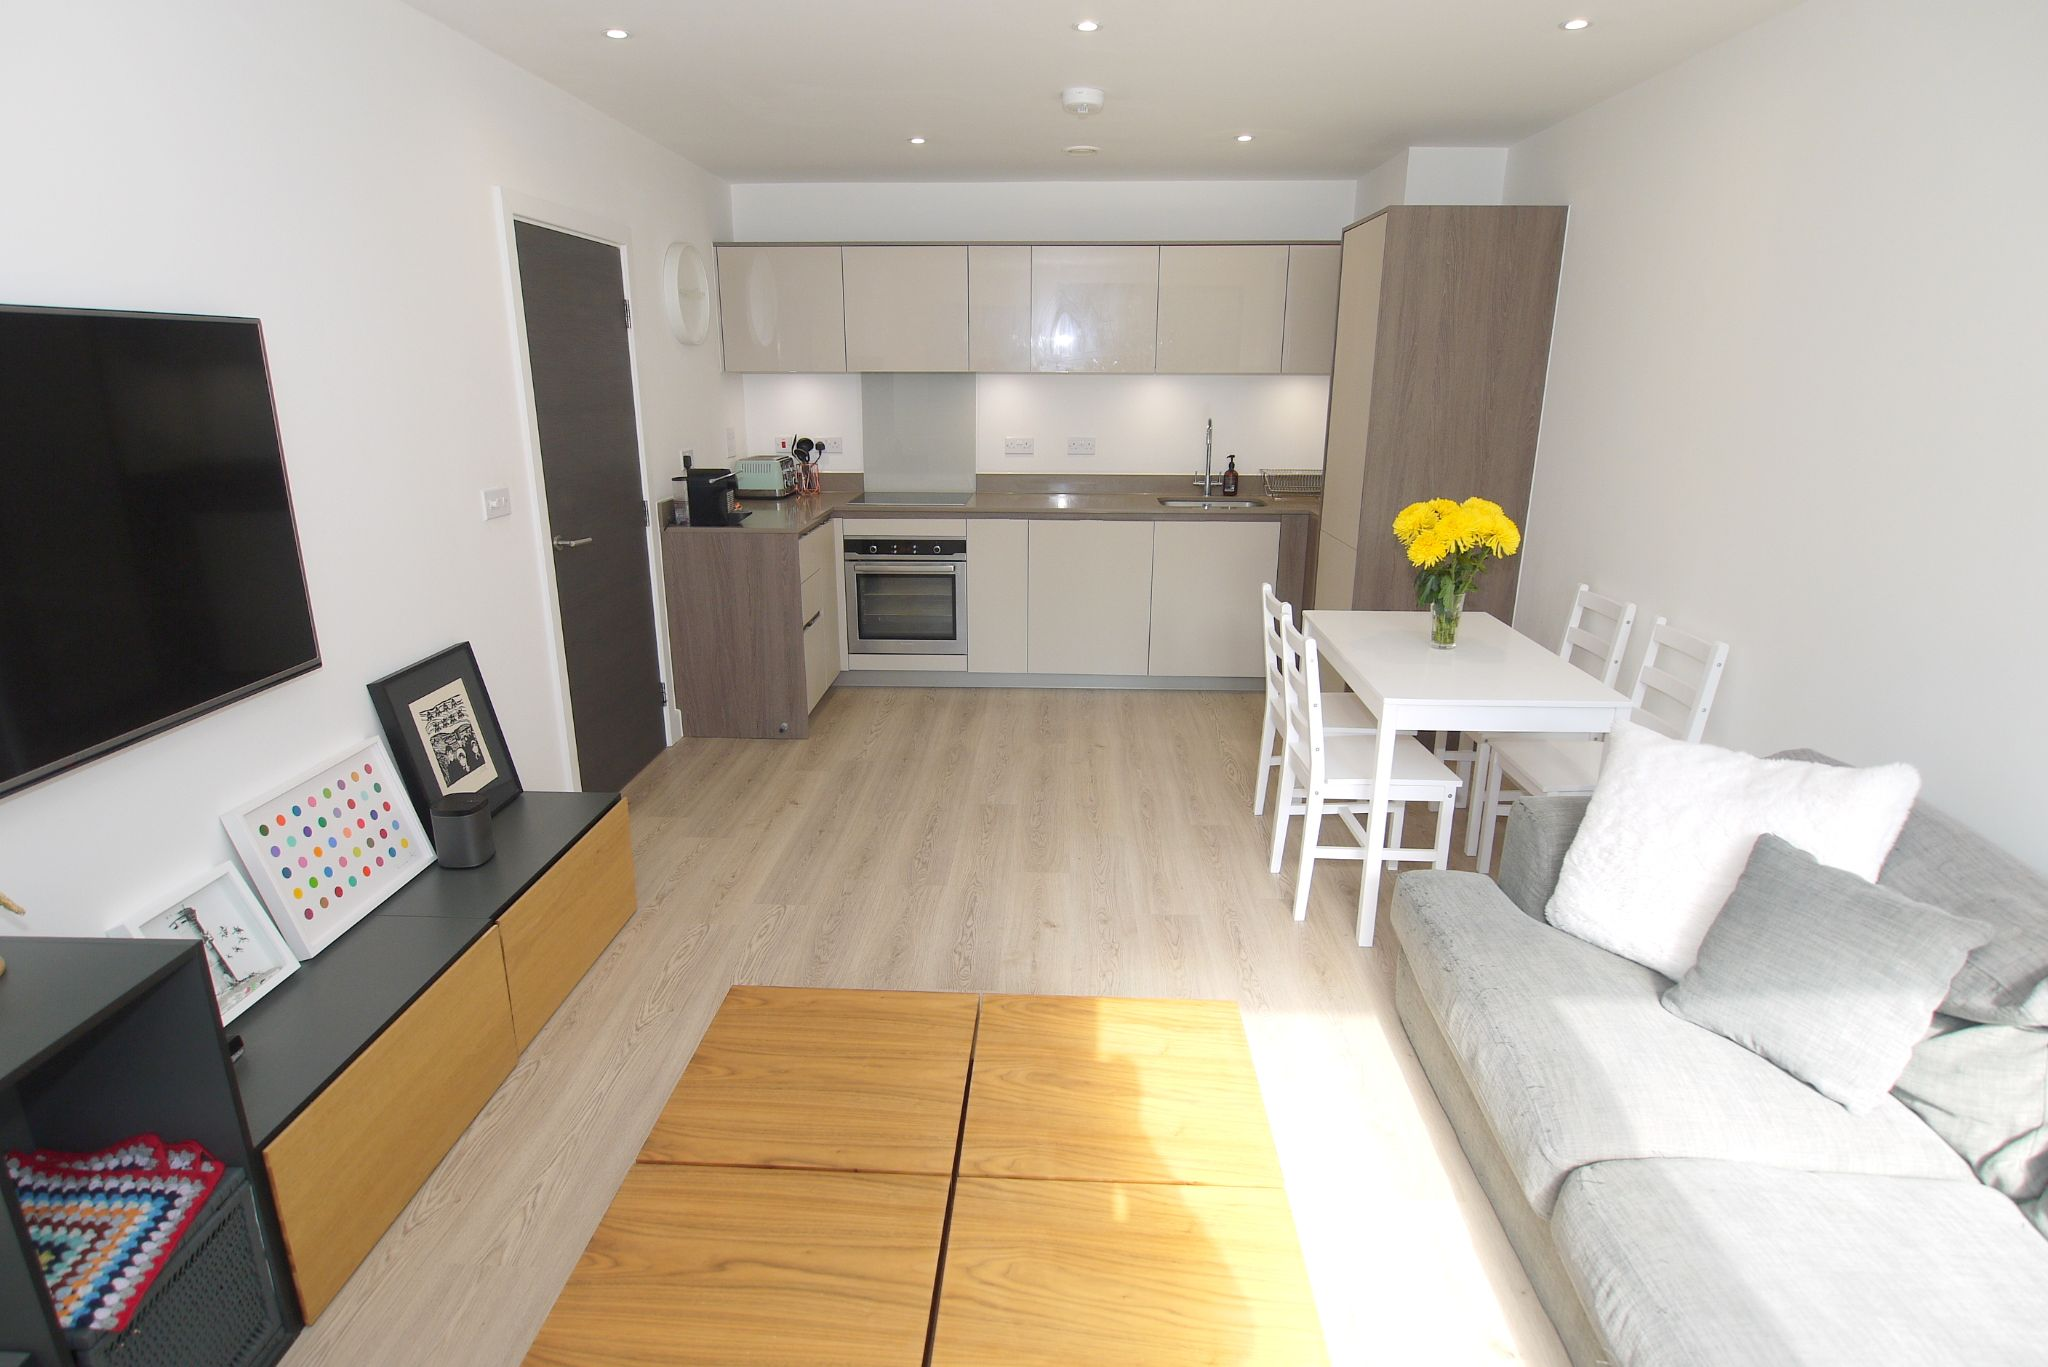 2 bedroom apartment For Sale in Sevenoaks - Photograph 4